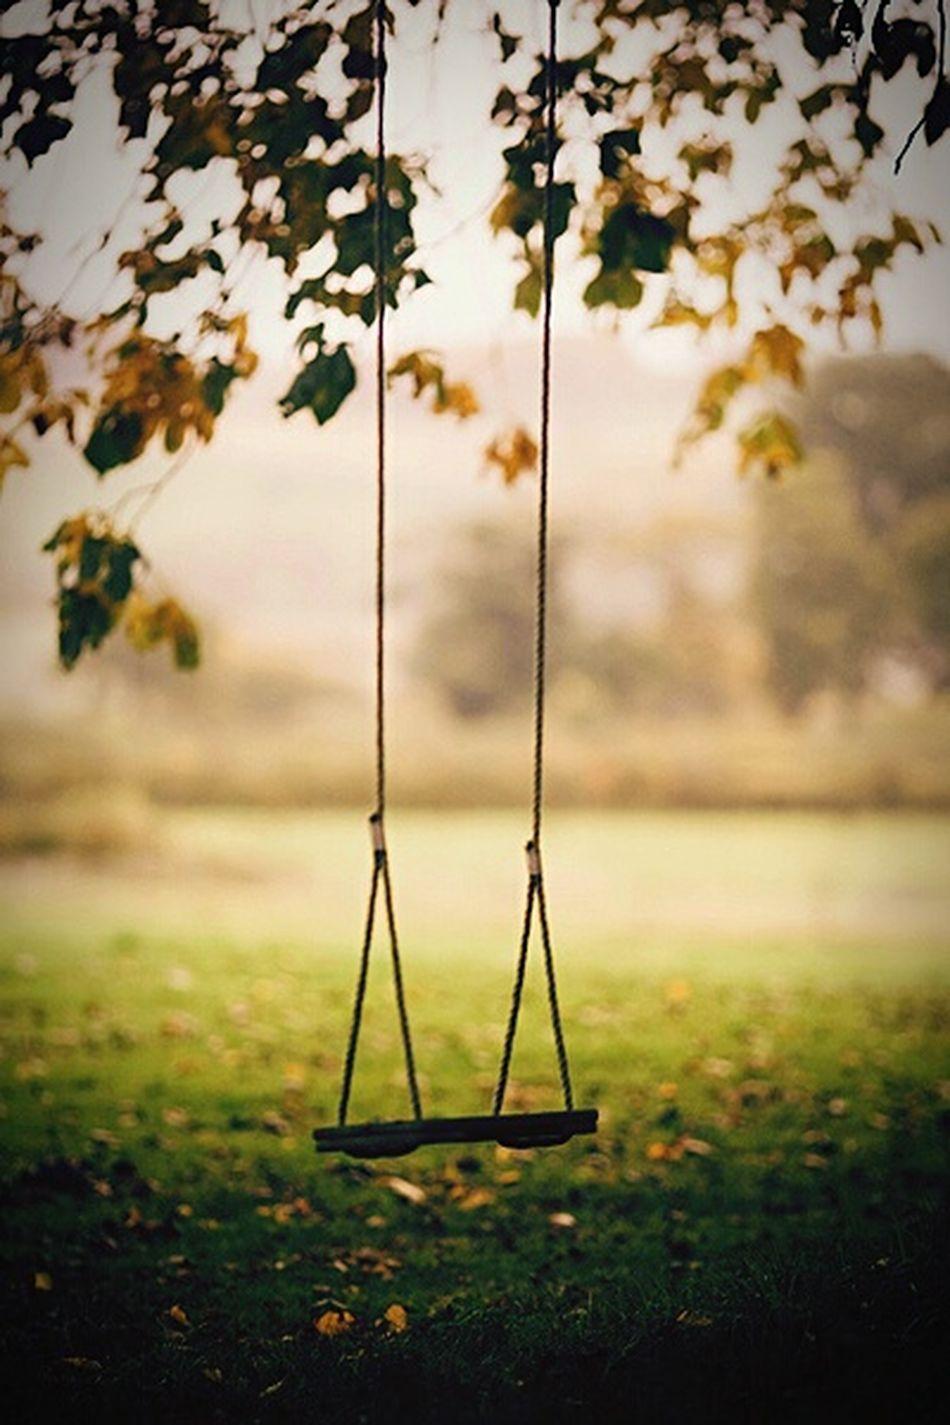 Lifeisbeautiful Enjoy Time Let's Swing Feeling Free